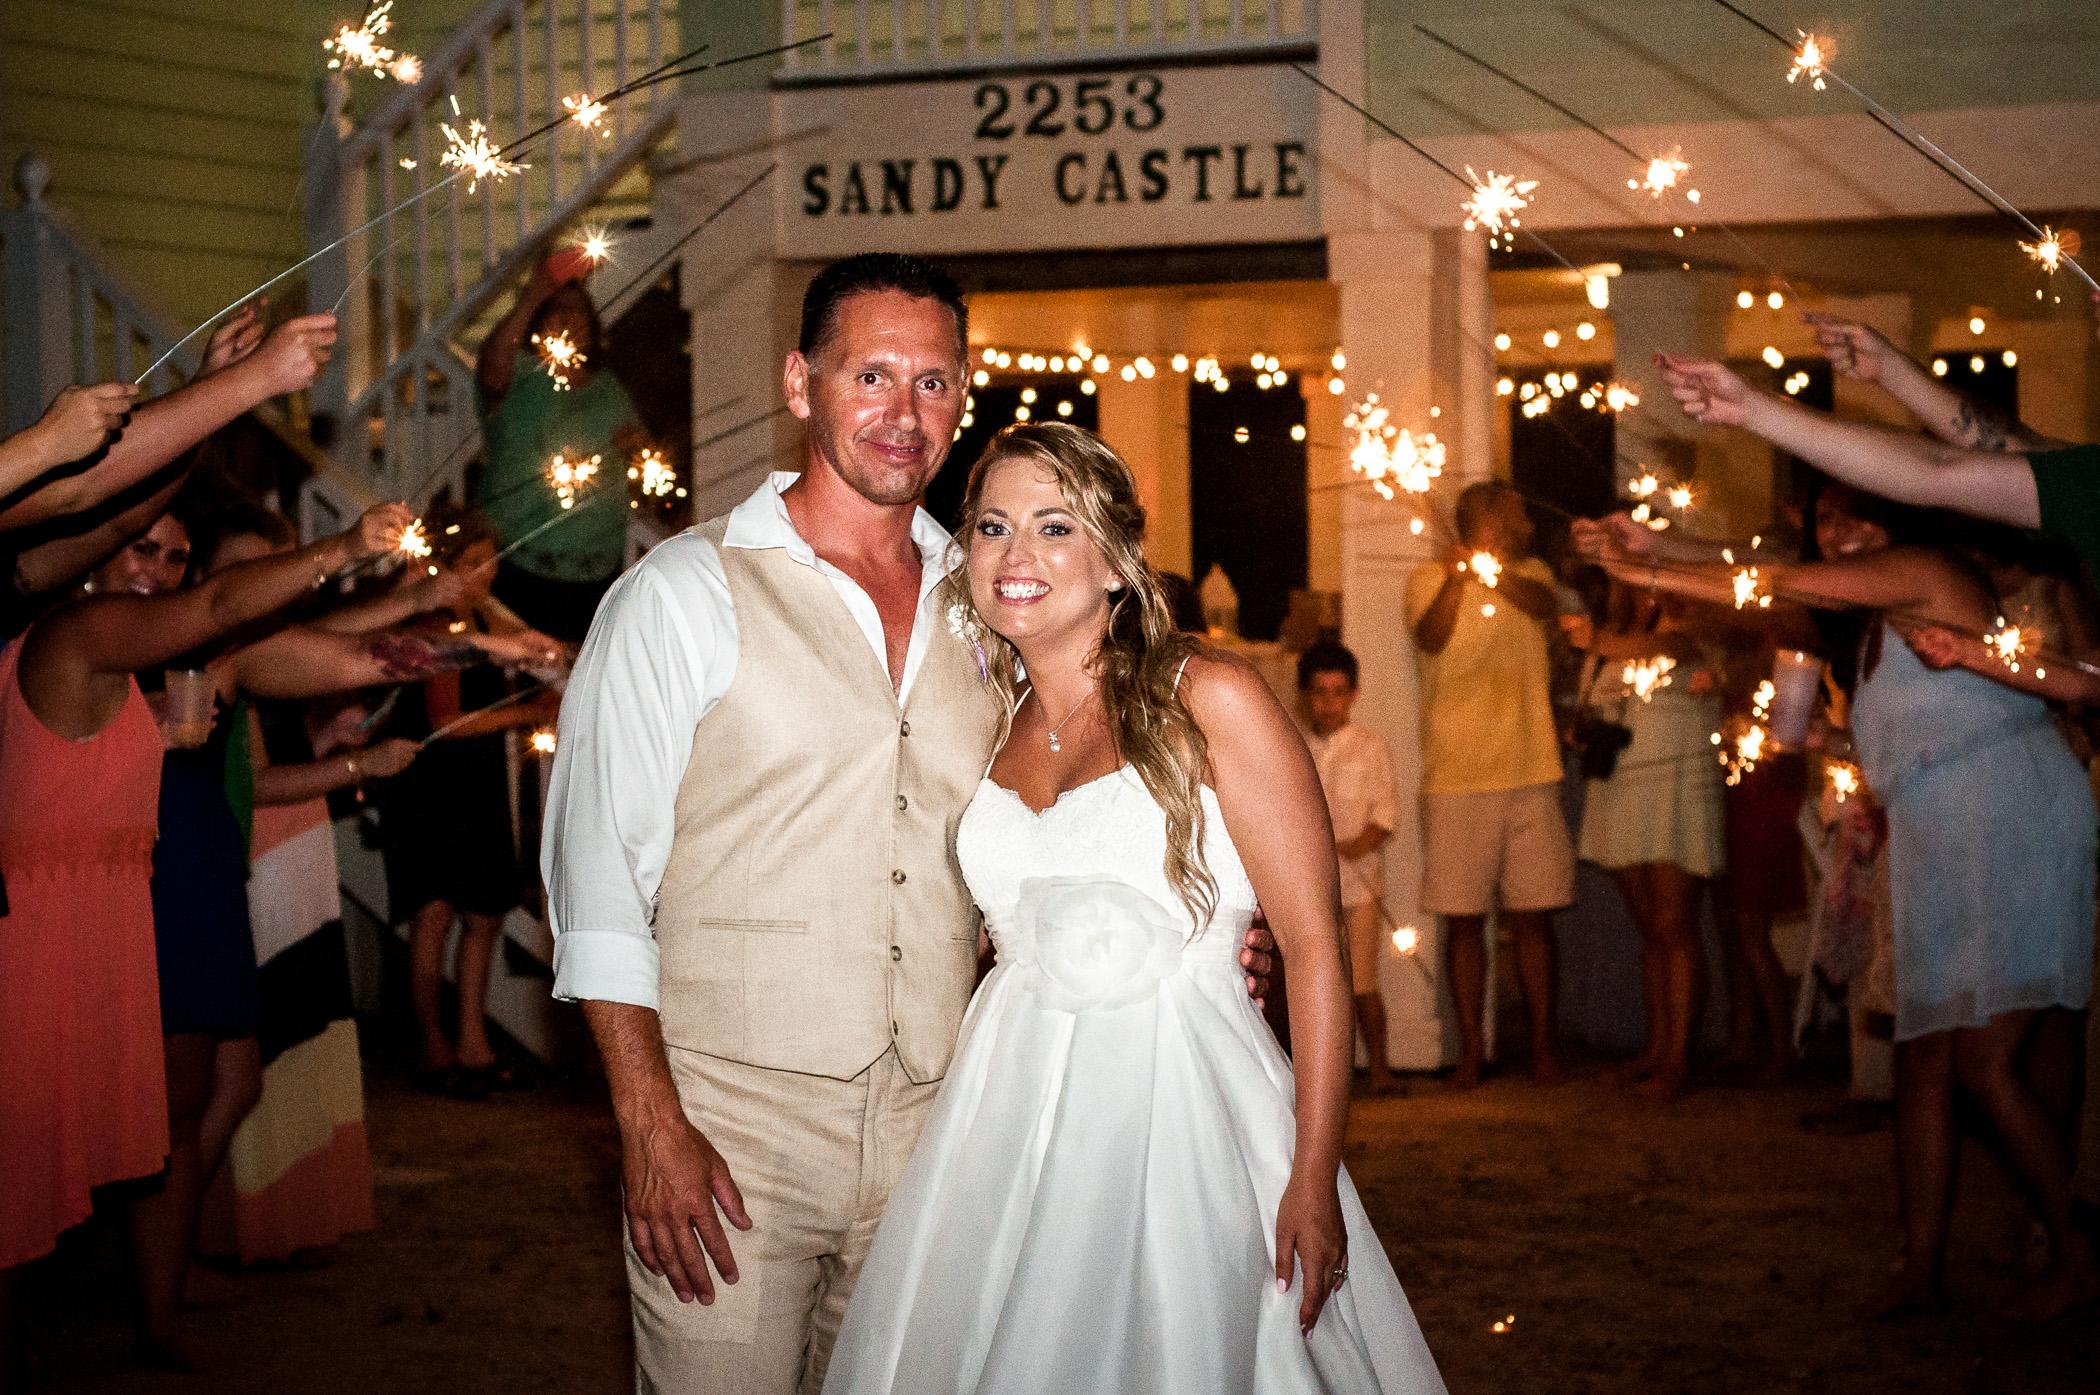 Gulf_Shores_Beach_House_Wedding_2016-0045 copy.jpg